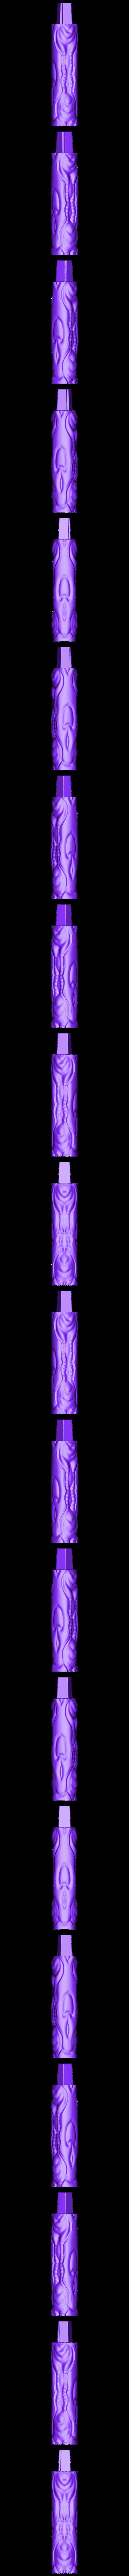 Aquaman_weapon_10.stl Download STL file Aquaman Trident Cosplay STL files - Costume Weapons 3D Printing • 3D printing design, 3DPrintModelStoreSS